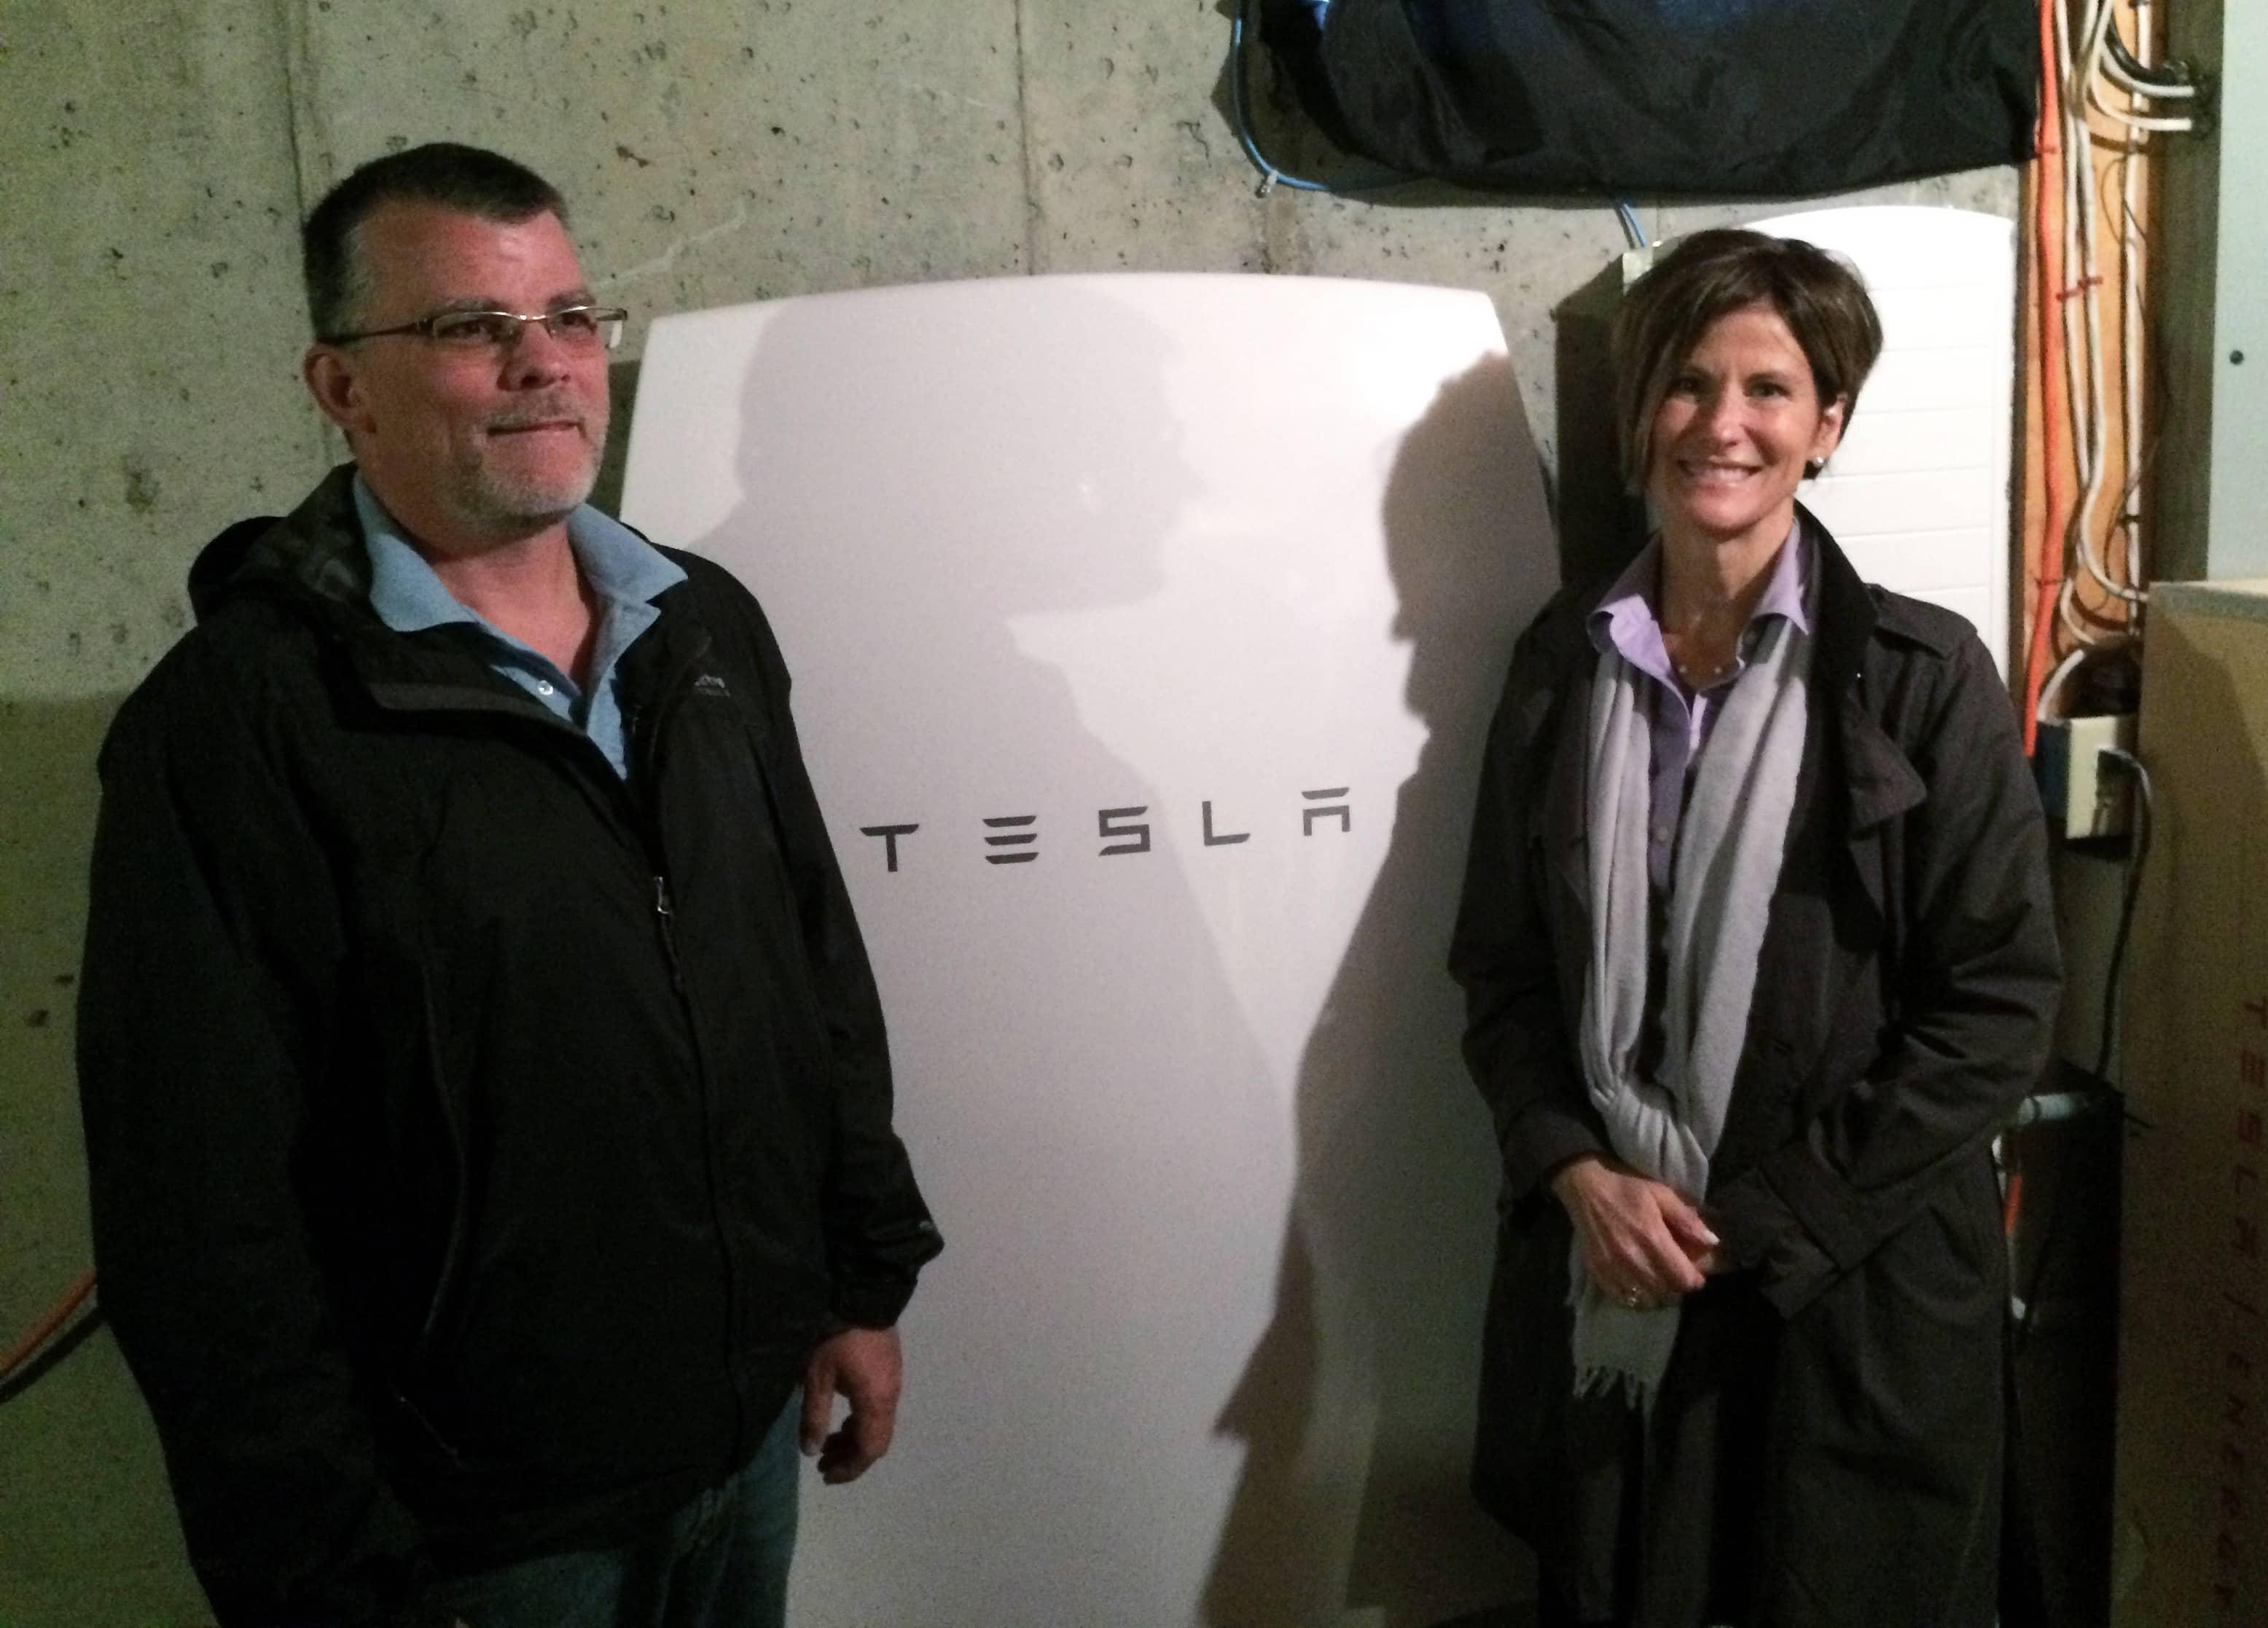 GMP-1 Vermont Utility Installs Tesla Powerwalls For Customers